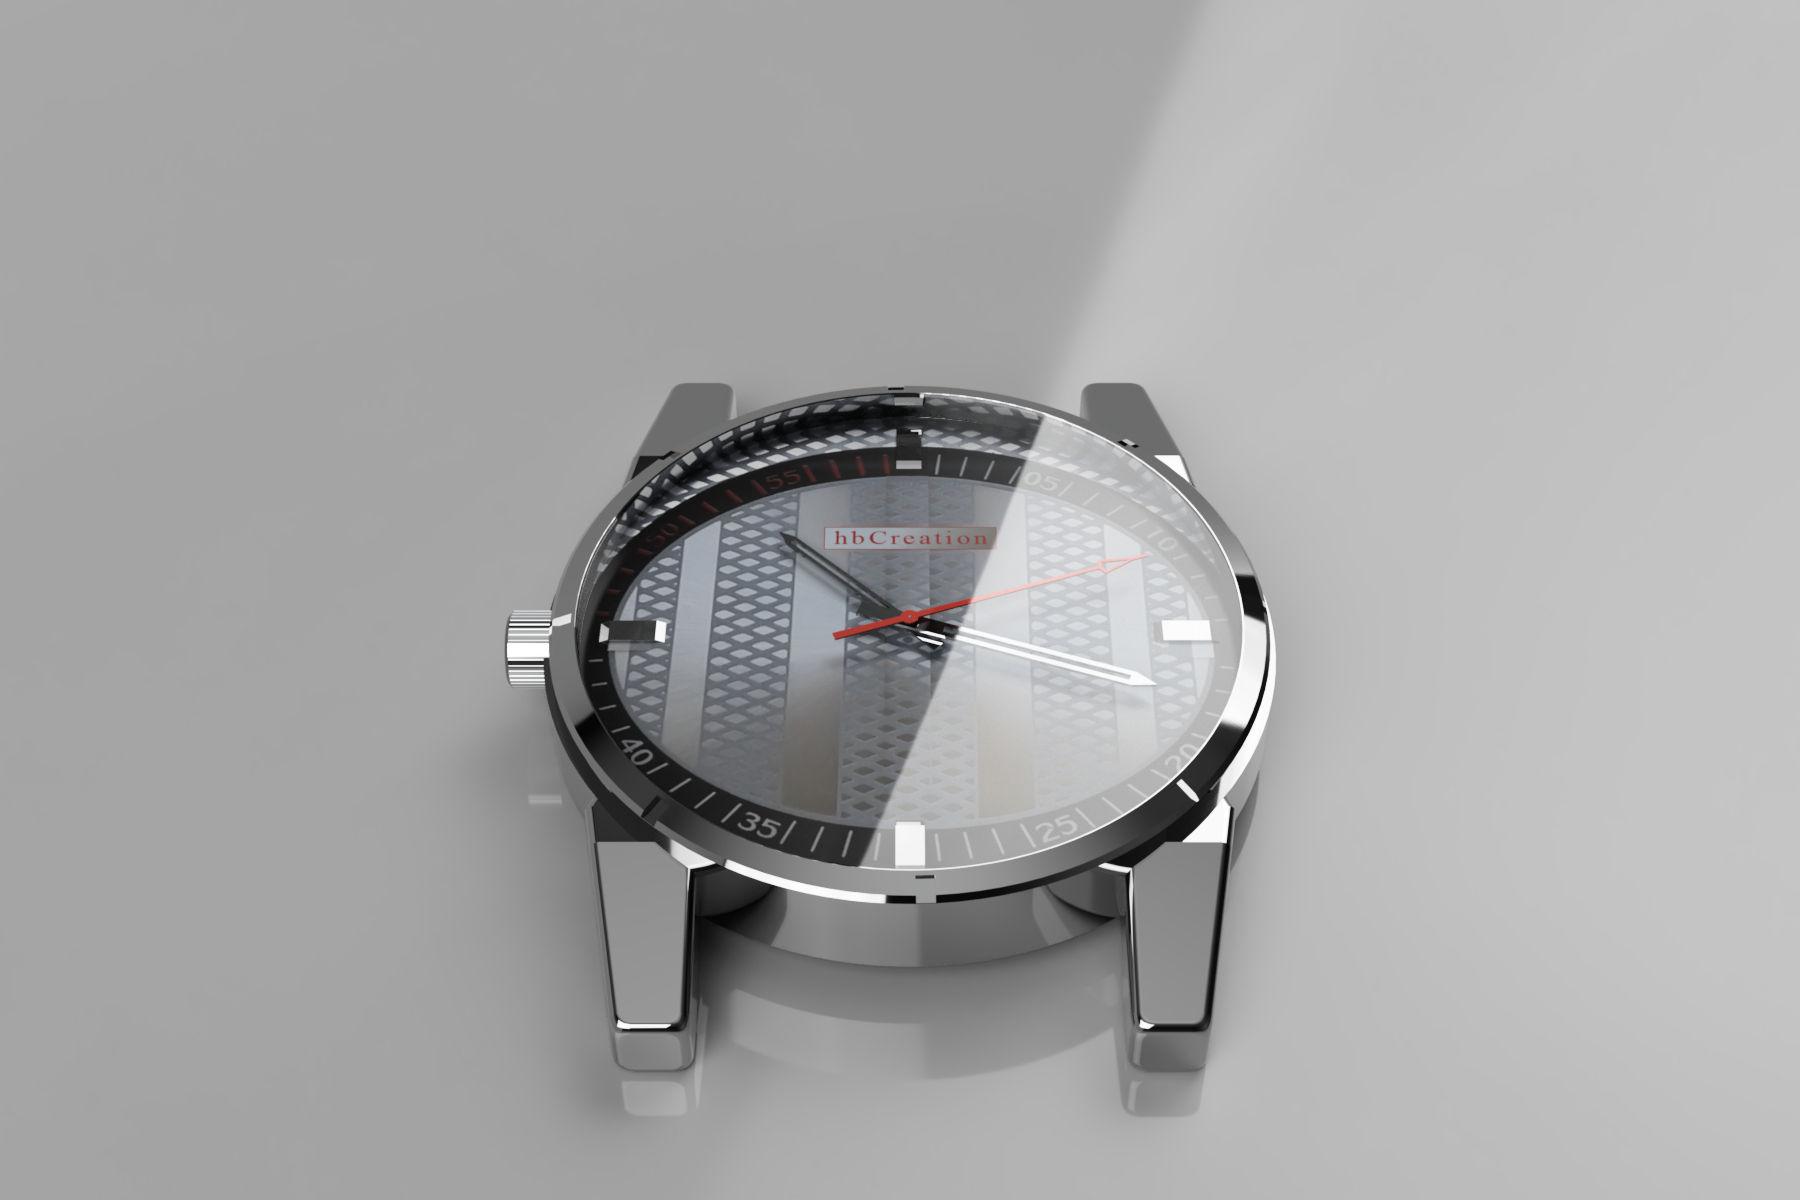 Design-watch-2018-jun-04-06-26-39pm-000-customizedview539734332-jpg-3500-3500